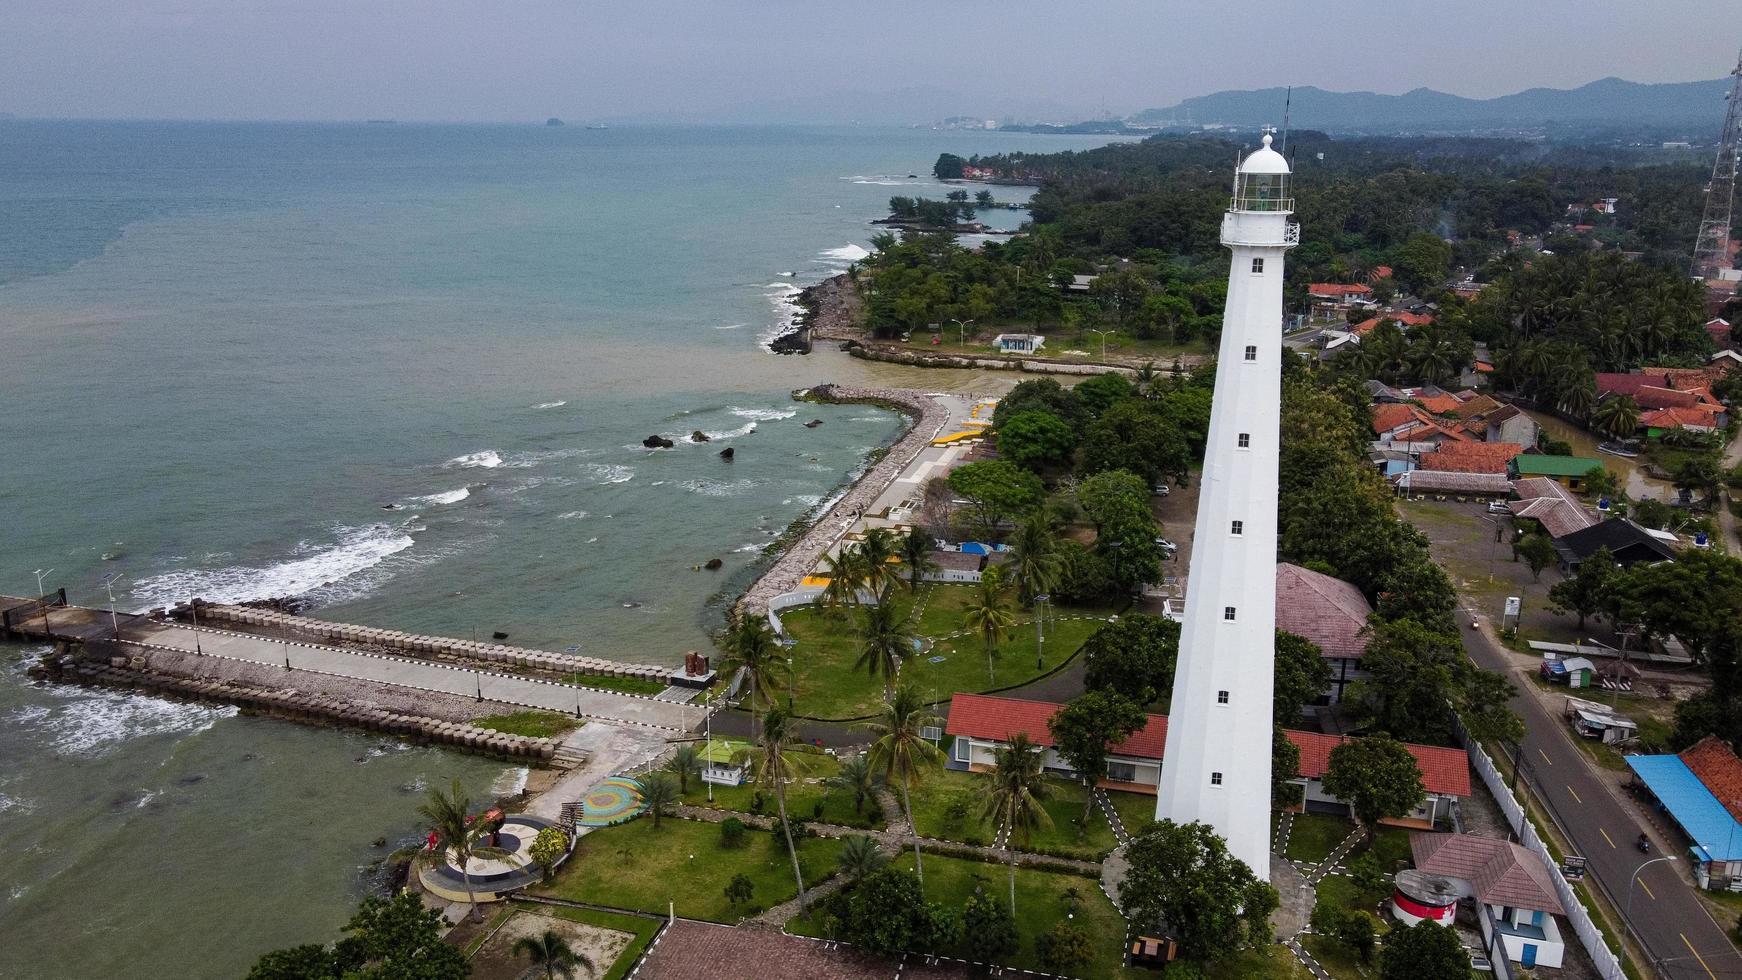 Banten, Indonesien 2021 - Flygfoto över fyren havet rock solnedgång landskap foto